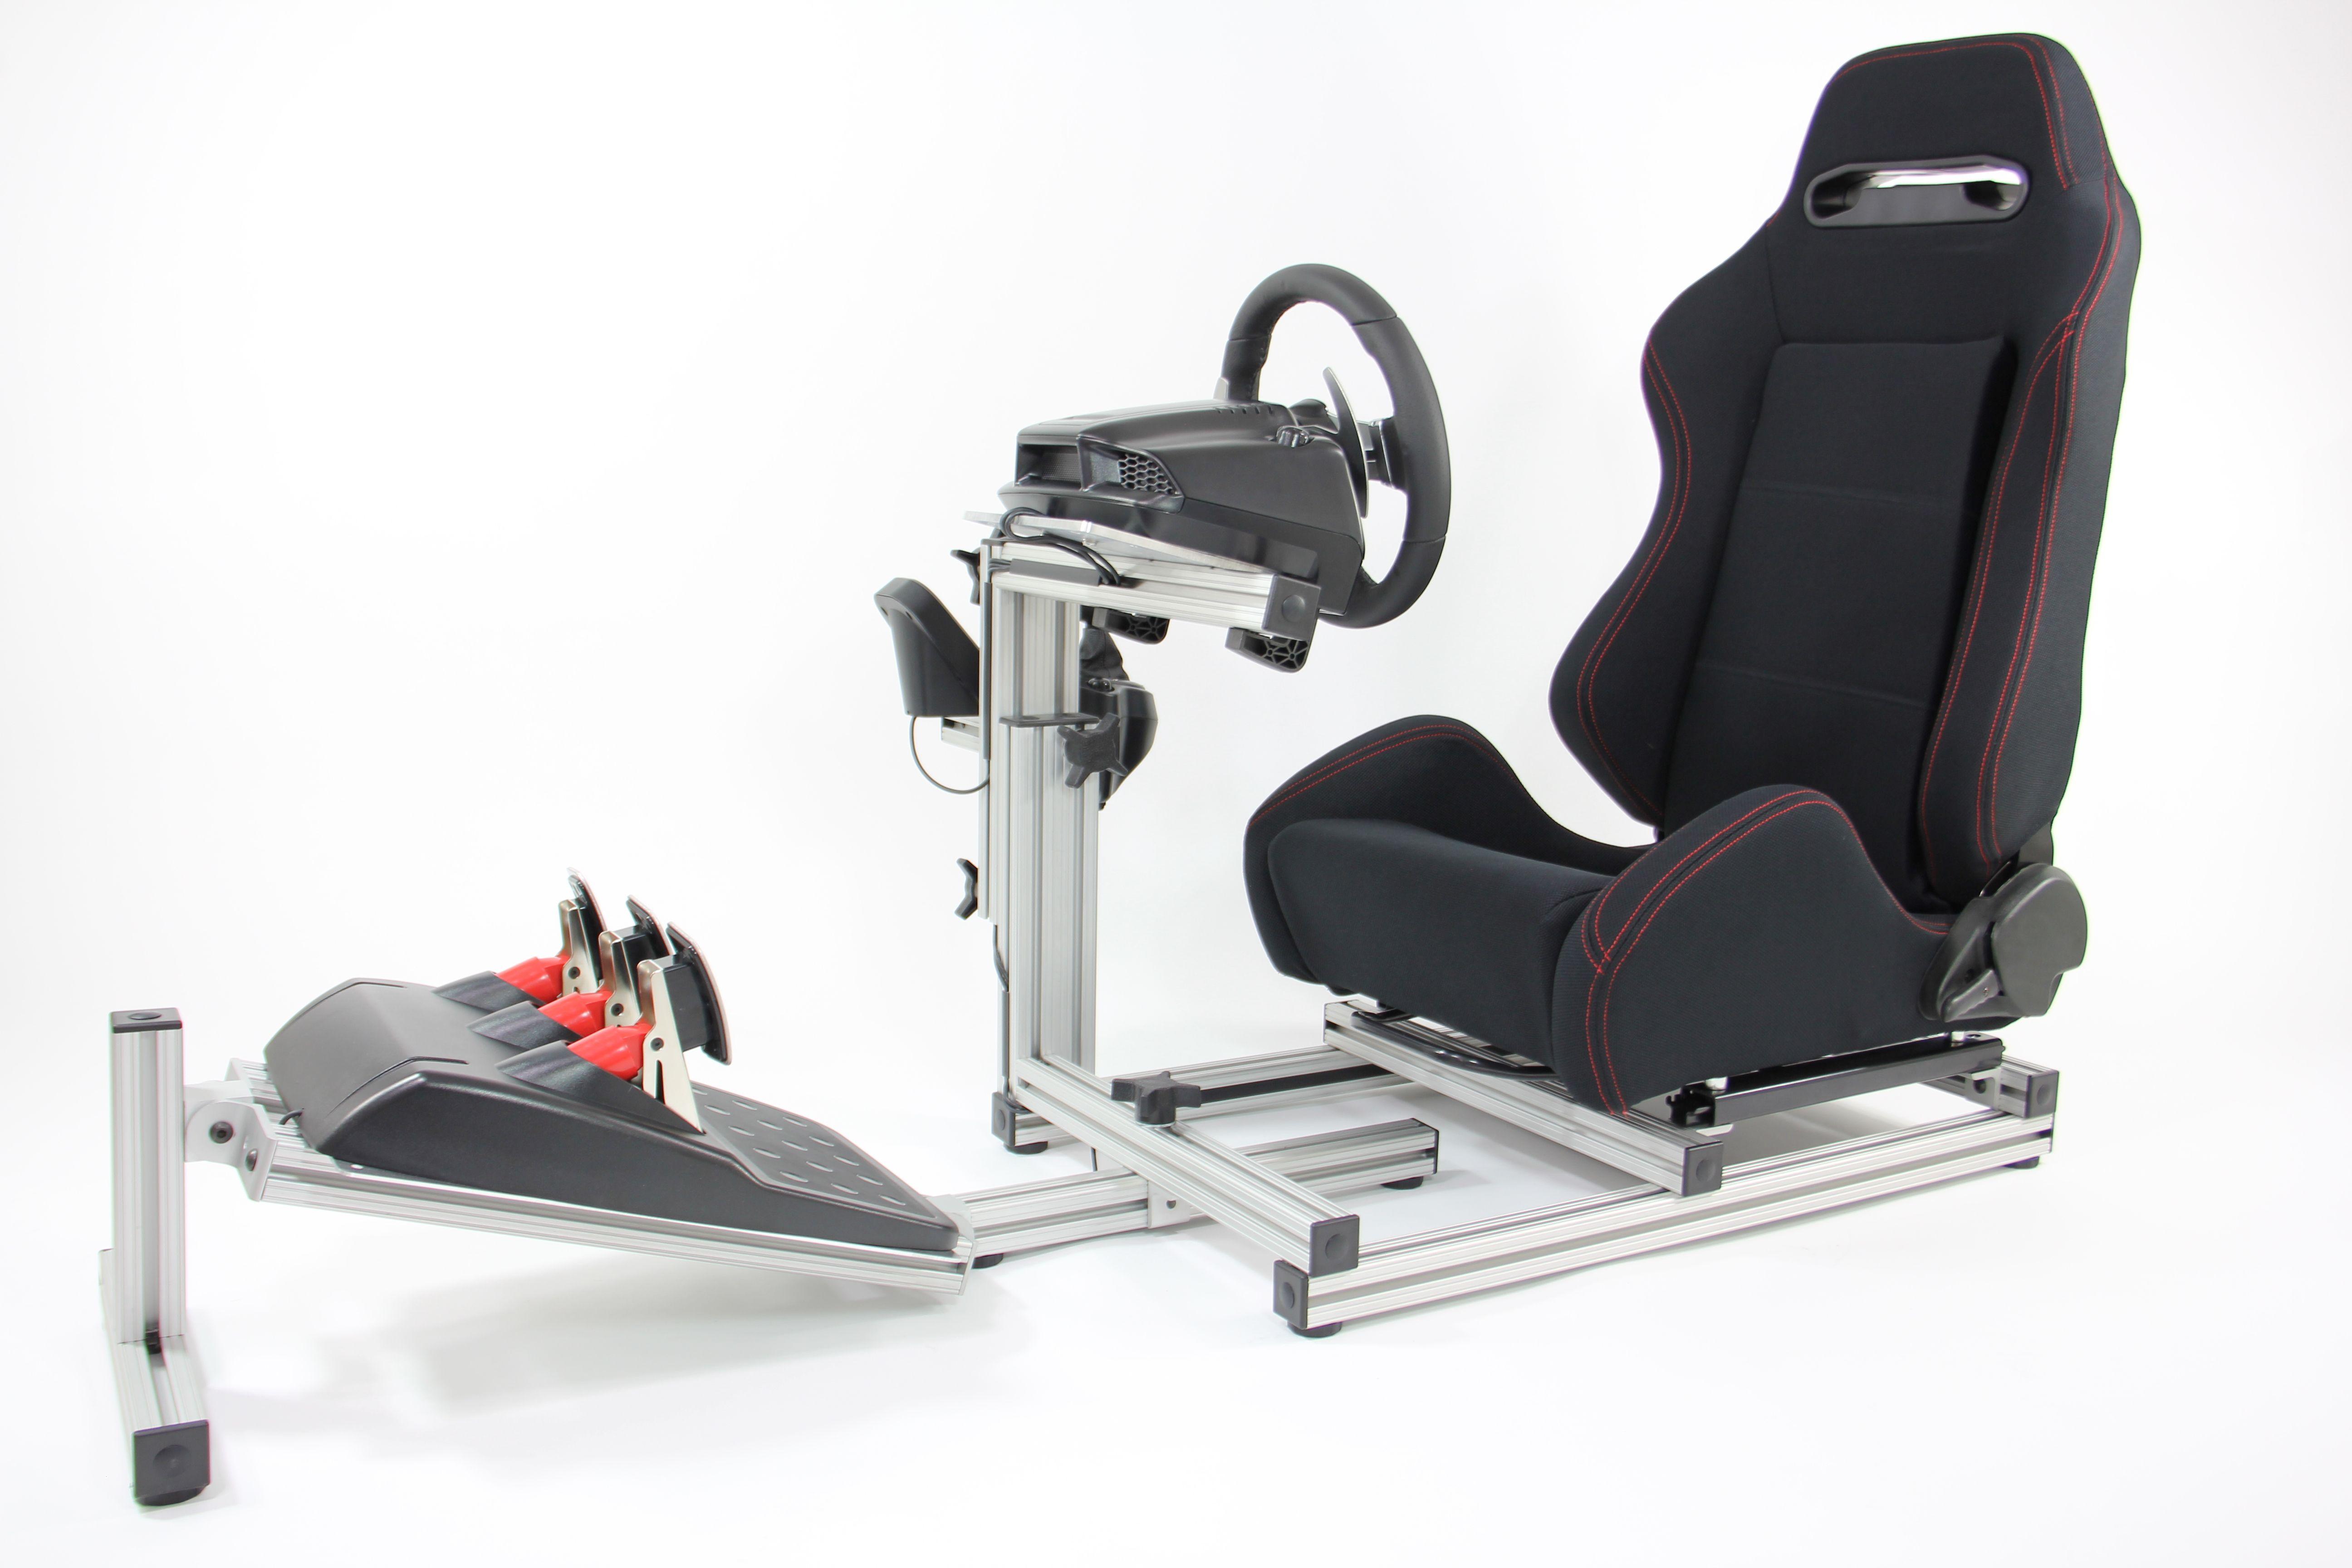 sim racing chair with wheels